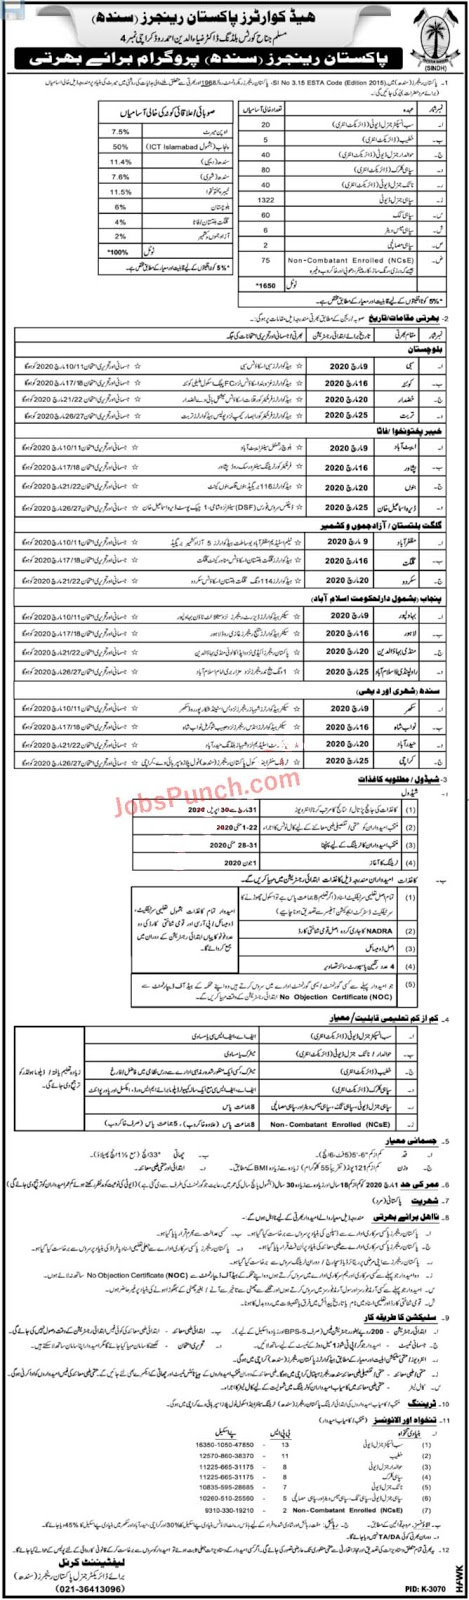 Pakistan Rangers Latest jobs vacancies 2020